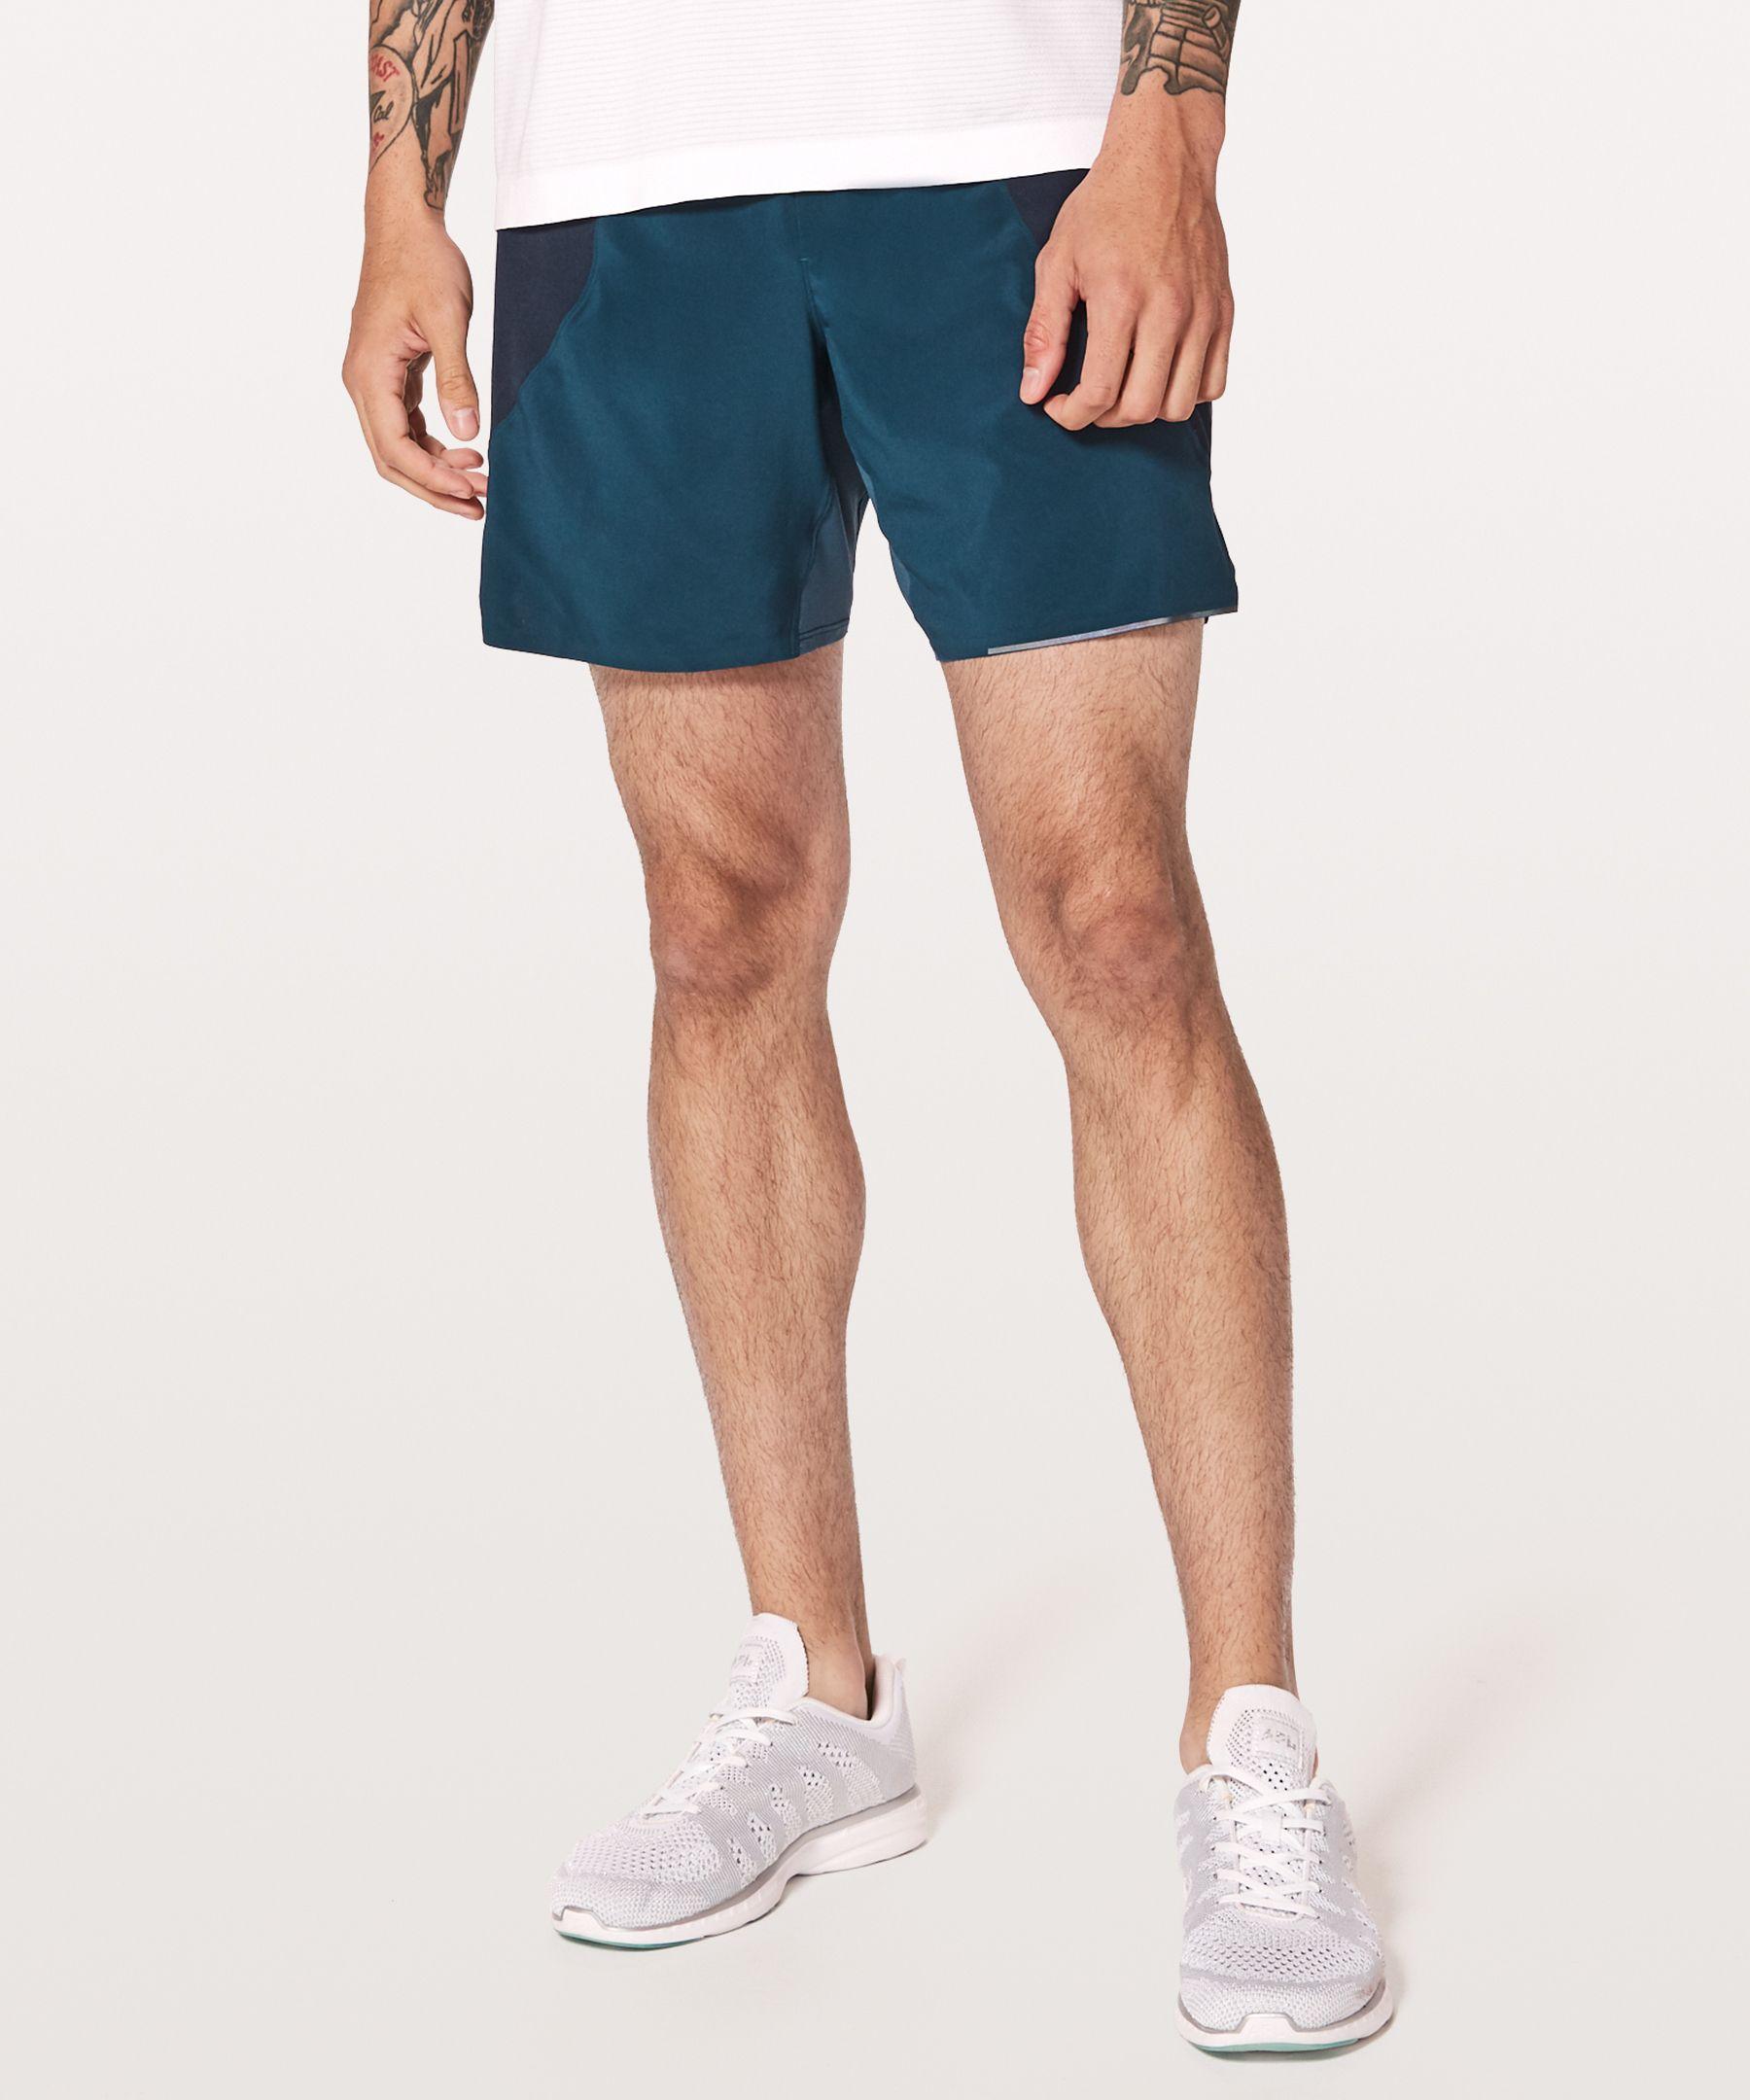 Switch up short 6 men 39 s shorts lululemon athletica for Online stores like lulus